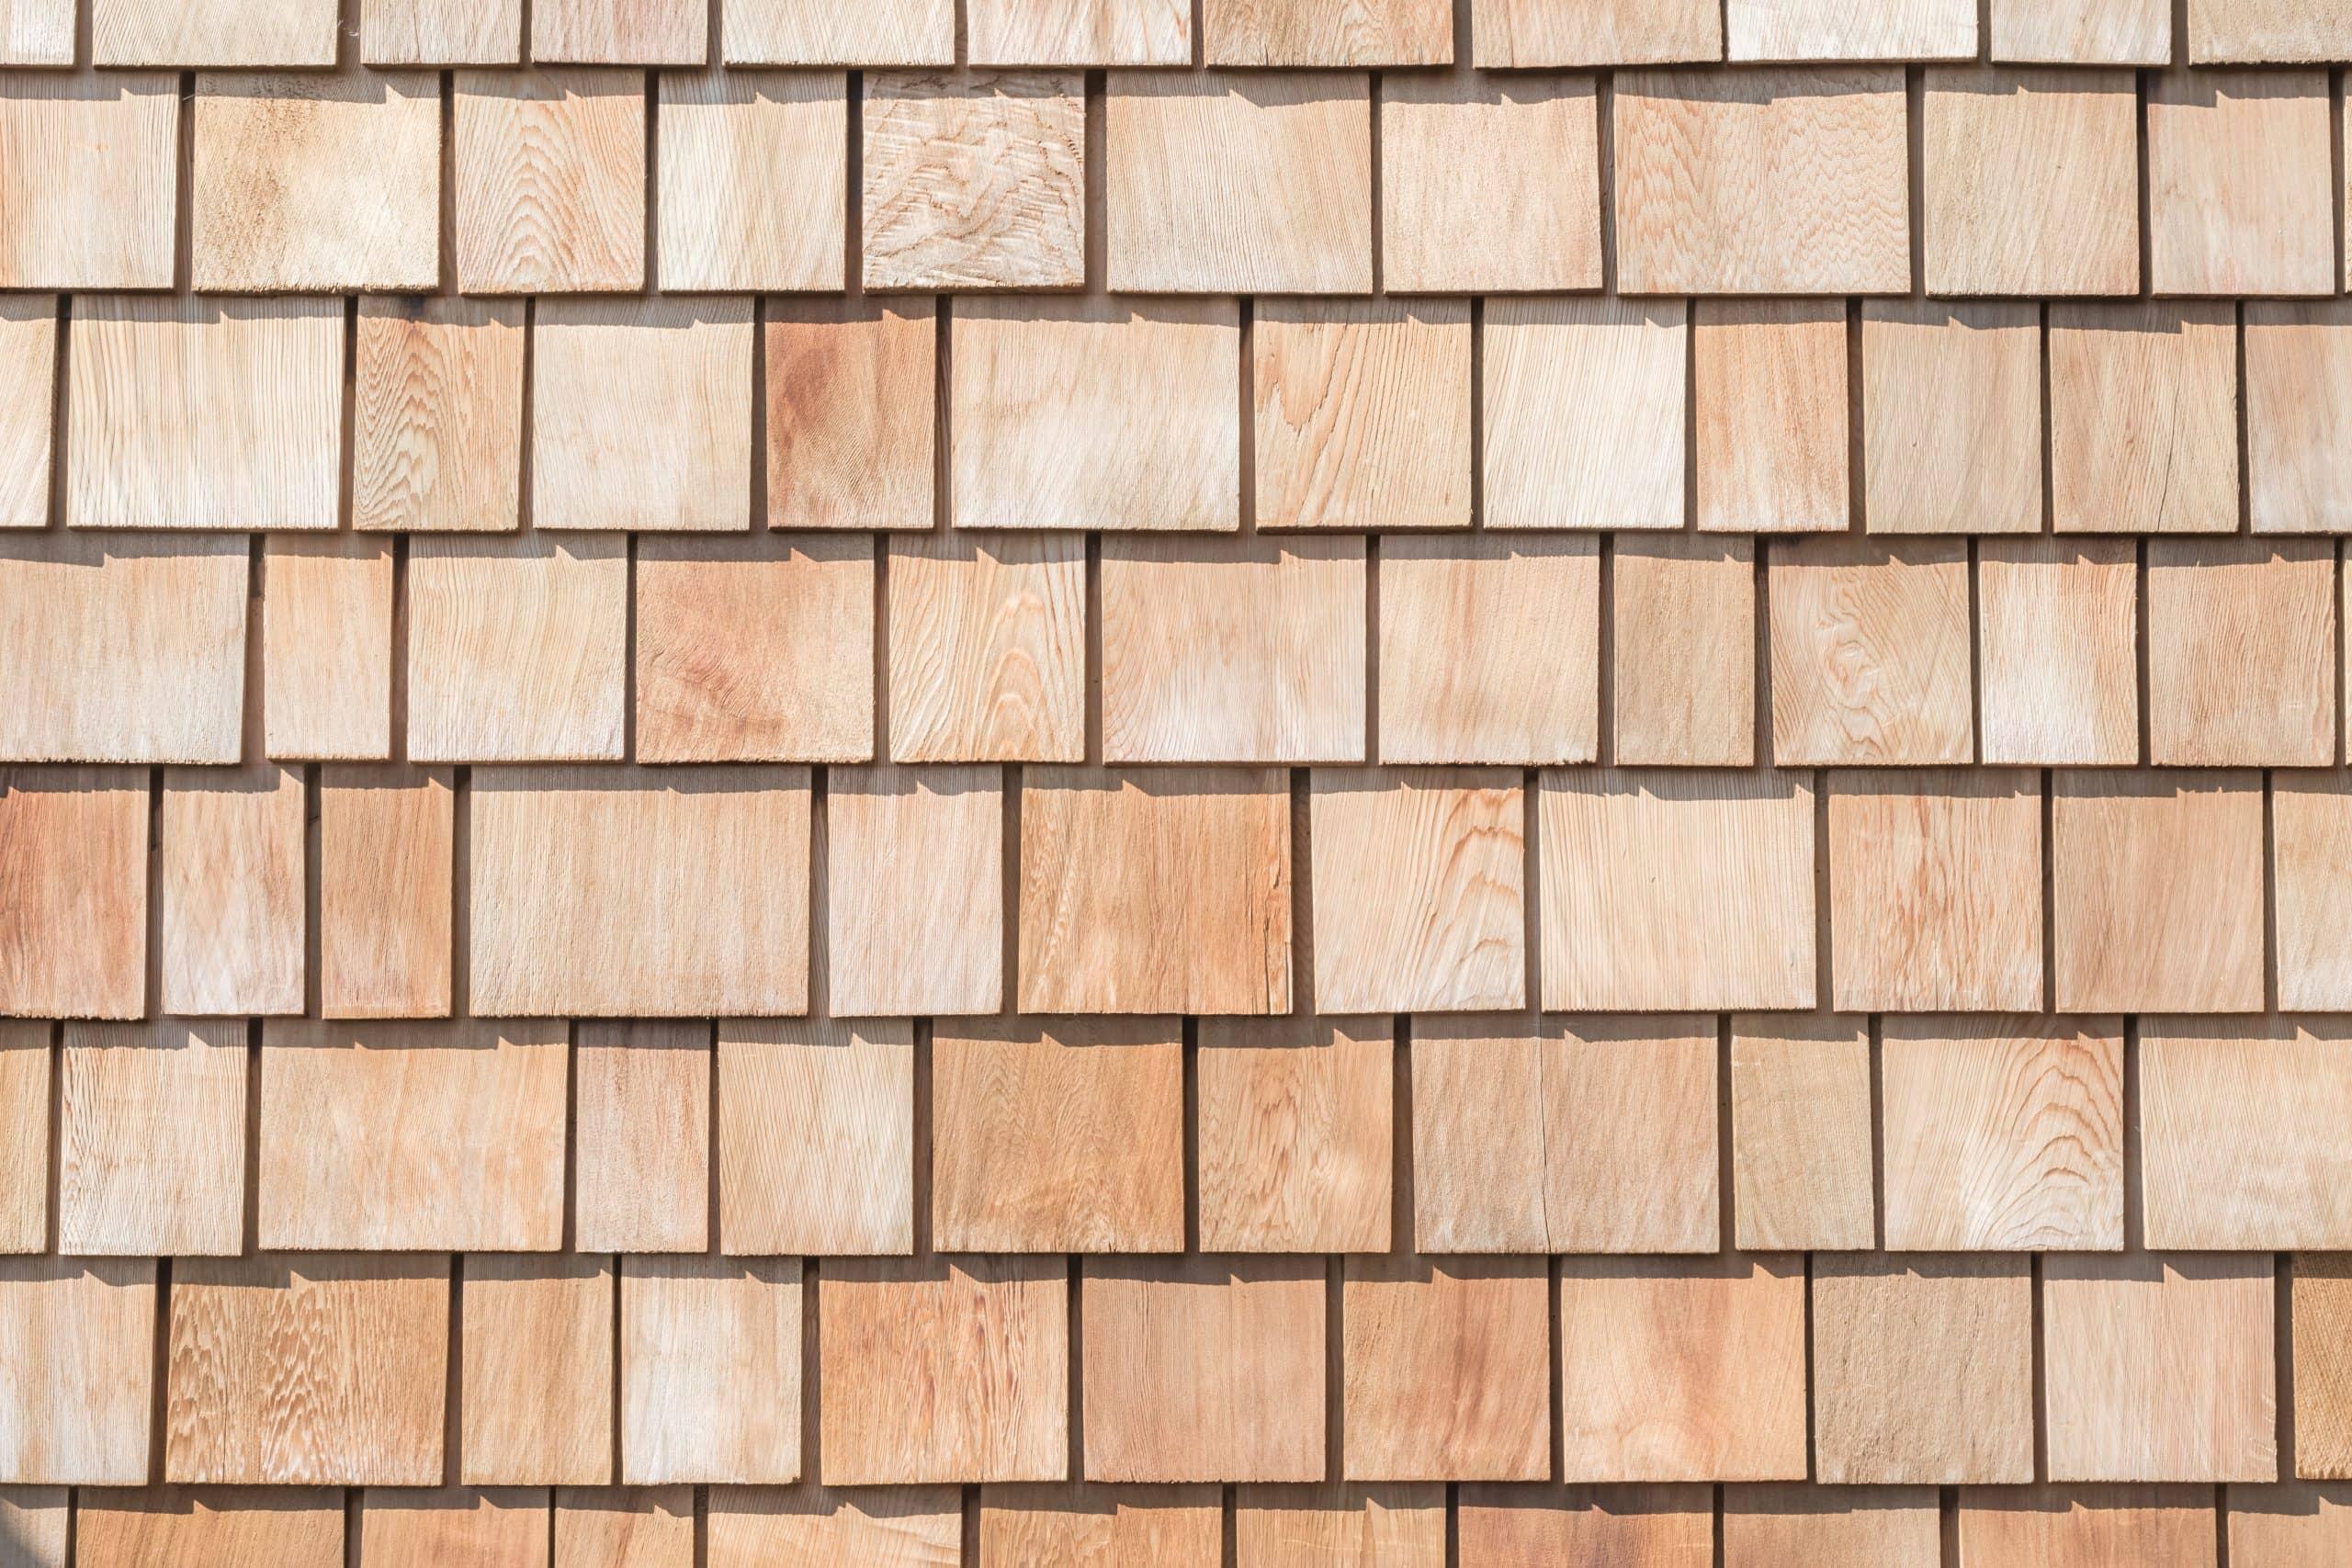 How Long Do Wood Shingles Last?